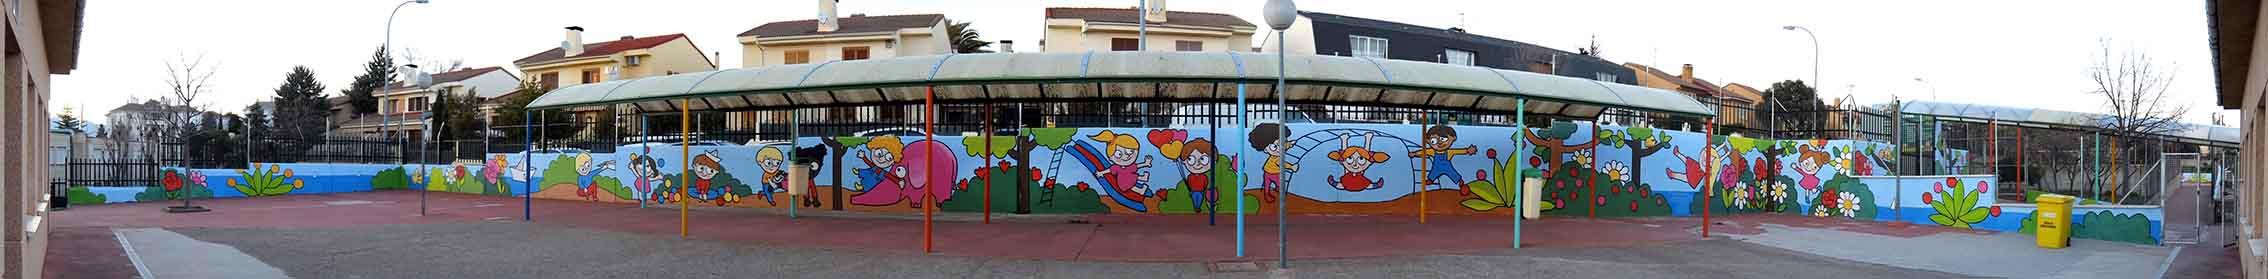 mural izas tierno galván infantil 9